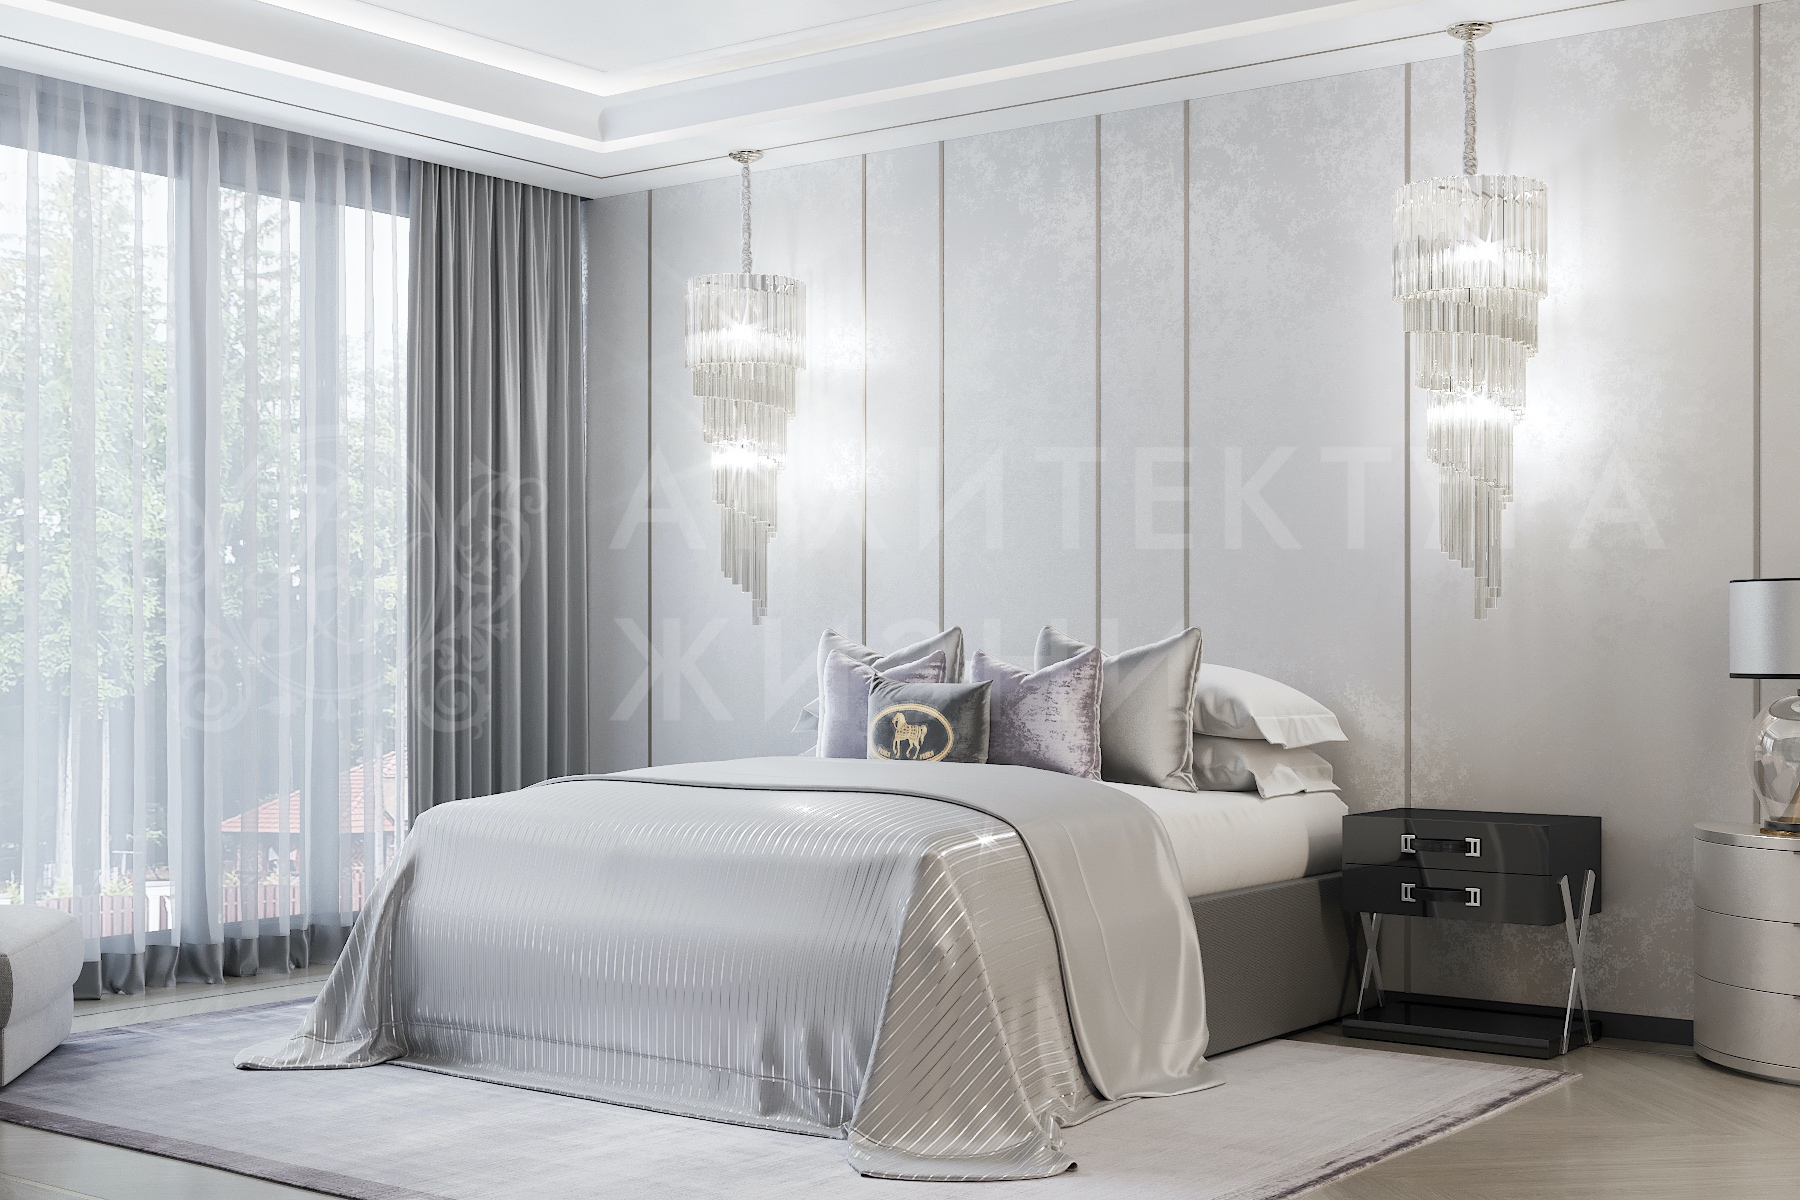 BedroomVid3.jpg